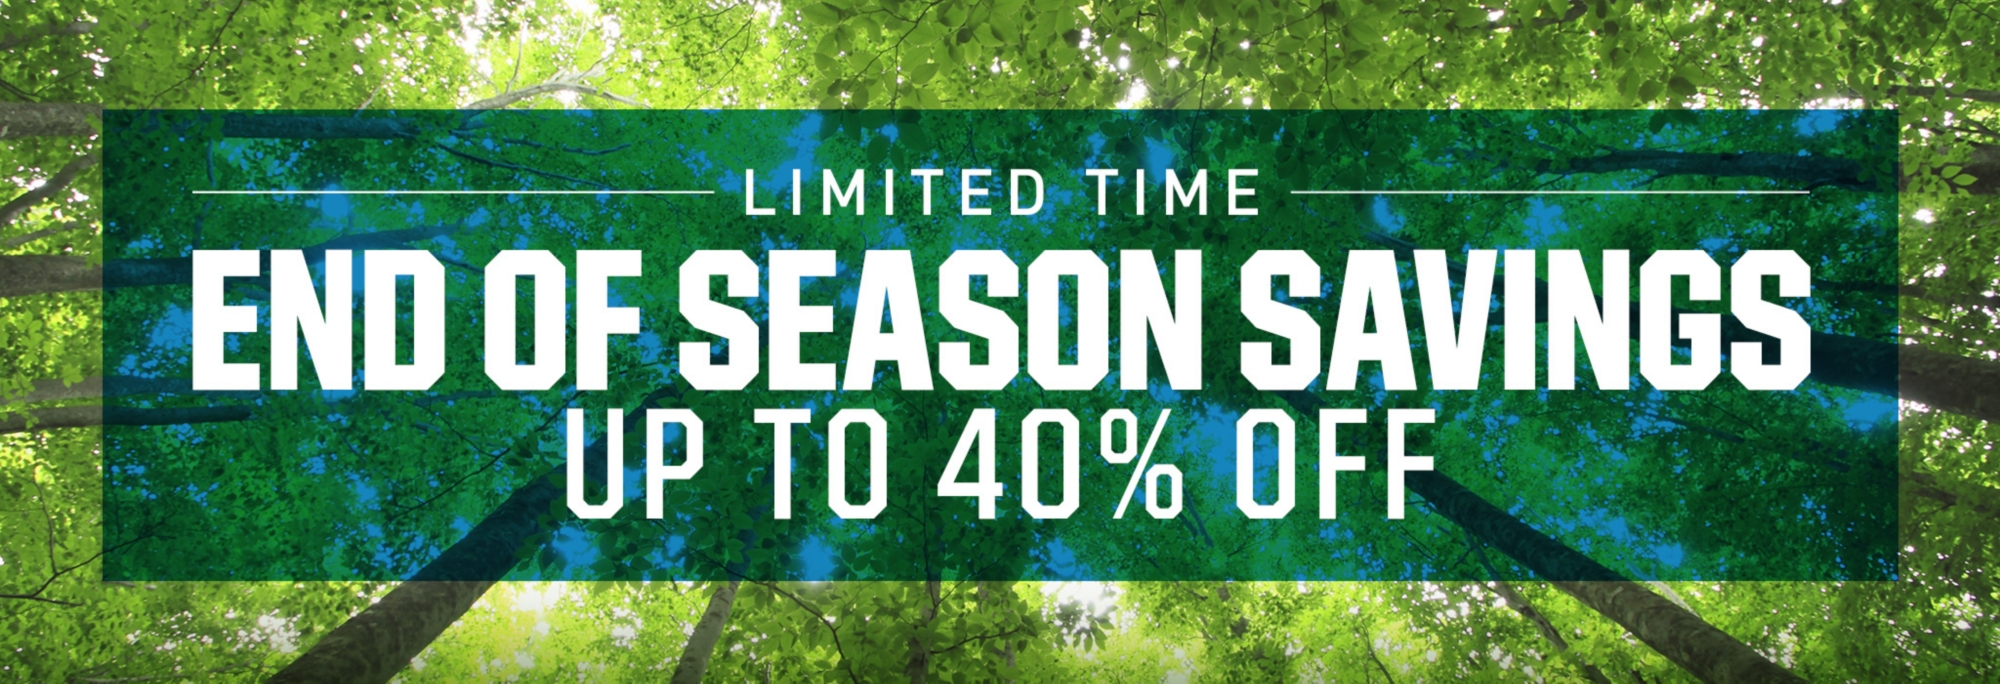 Shop Summer Savings